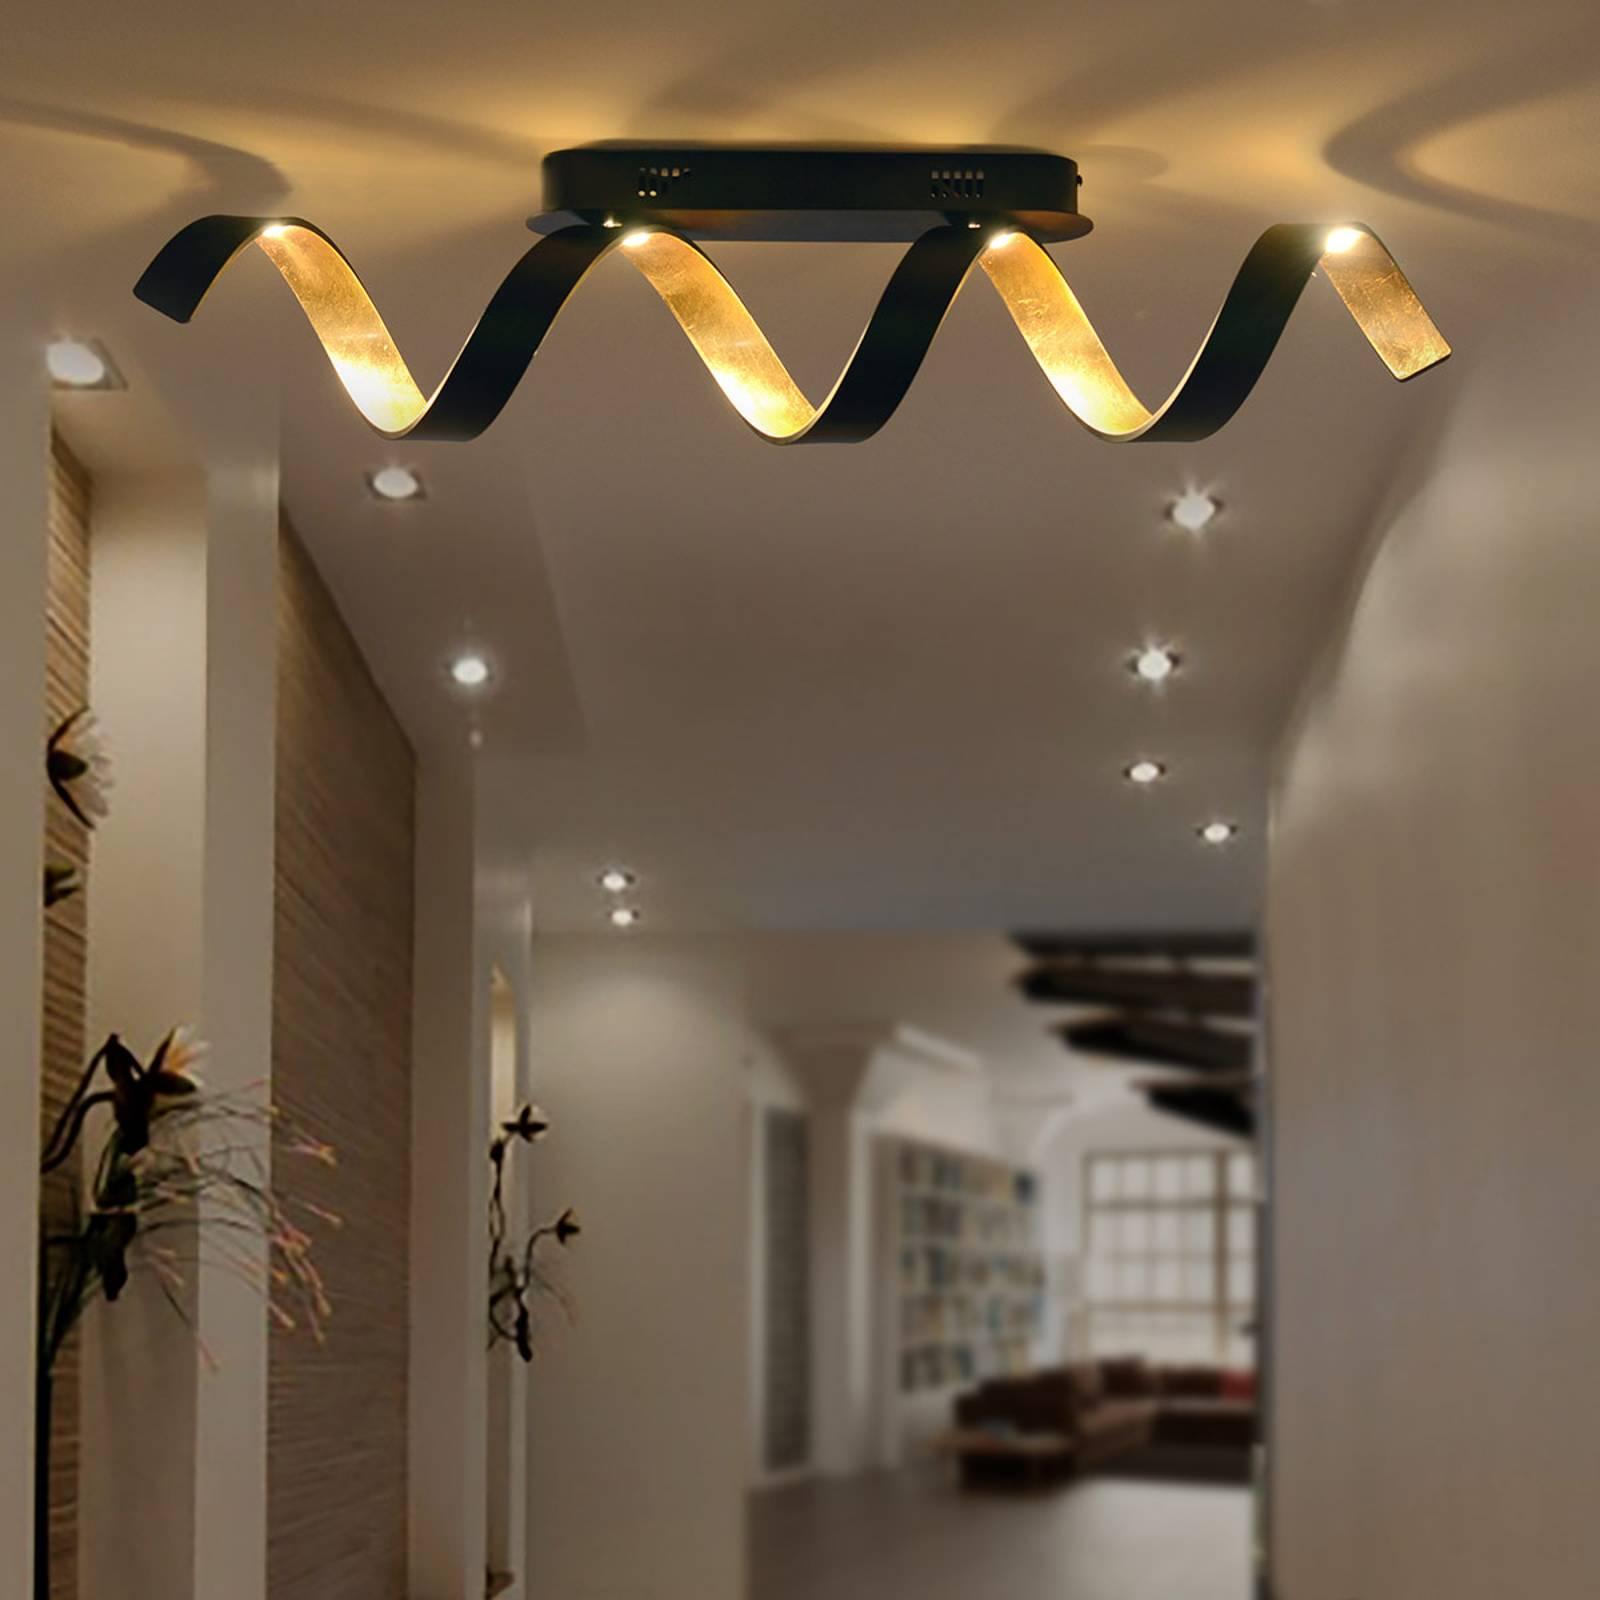 LED plafondlamp Helix in zwart-goud